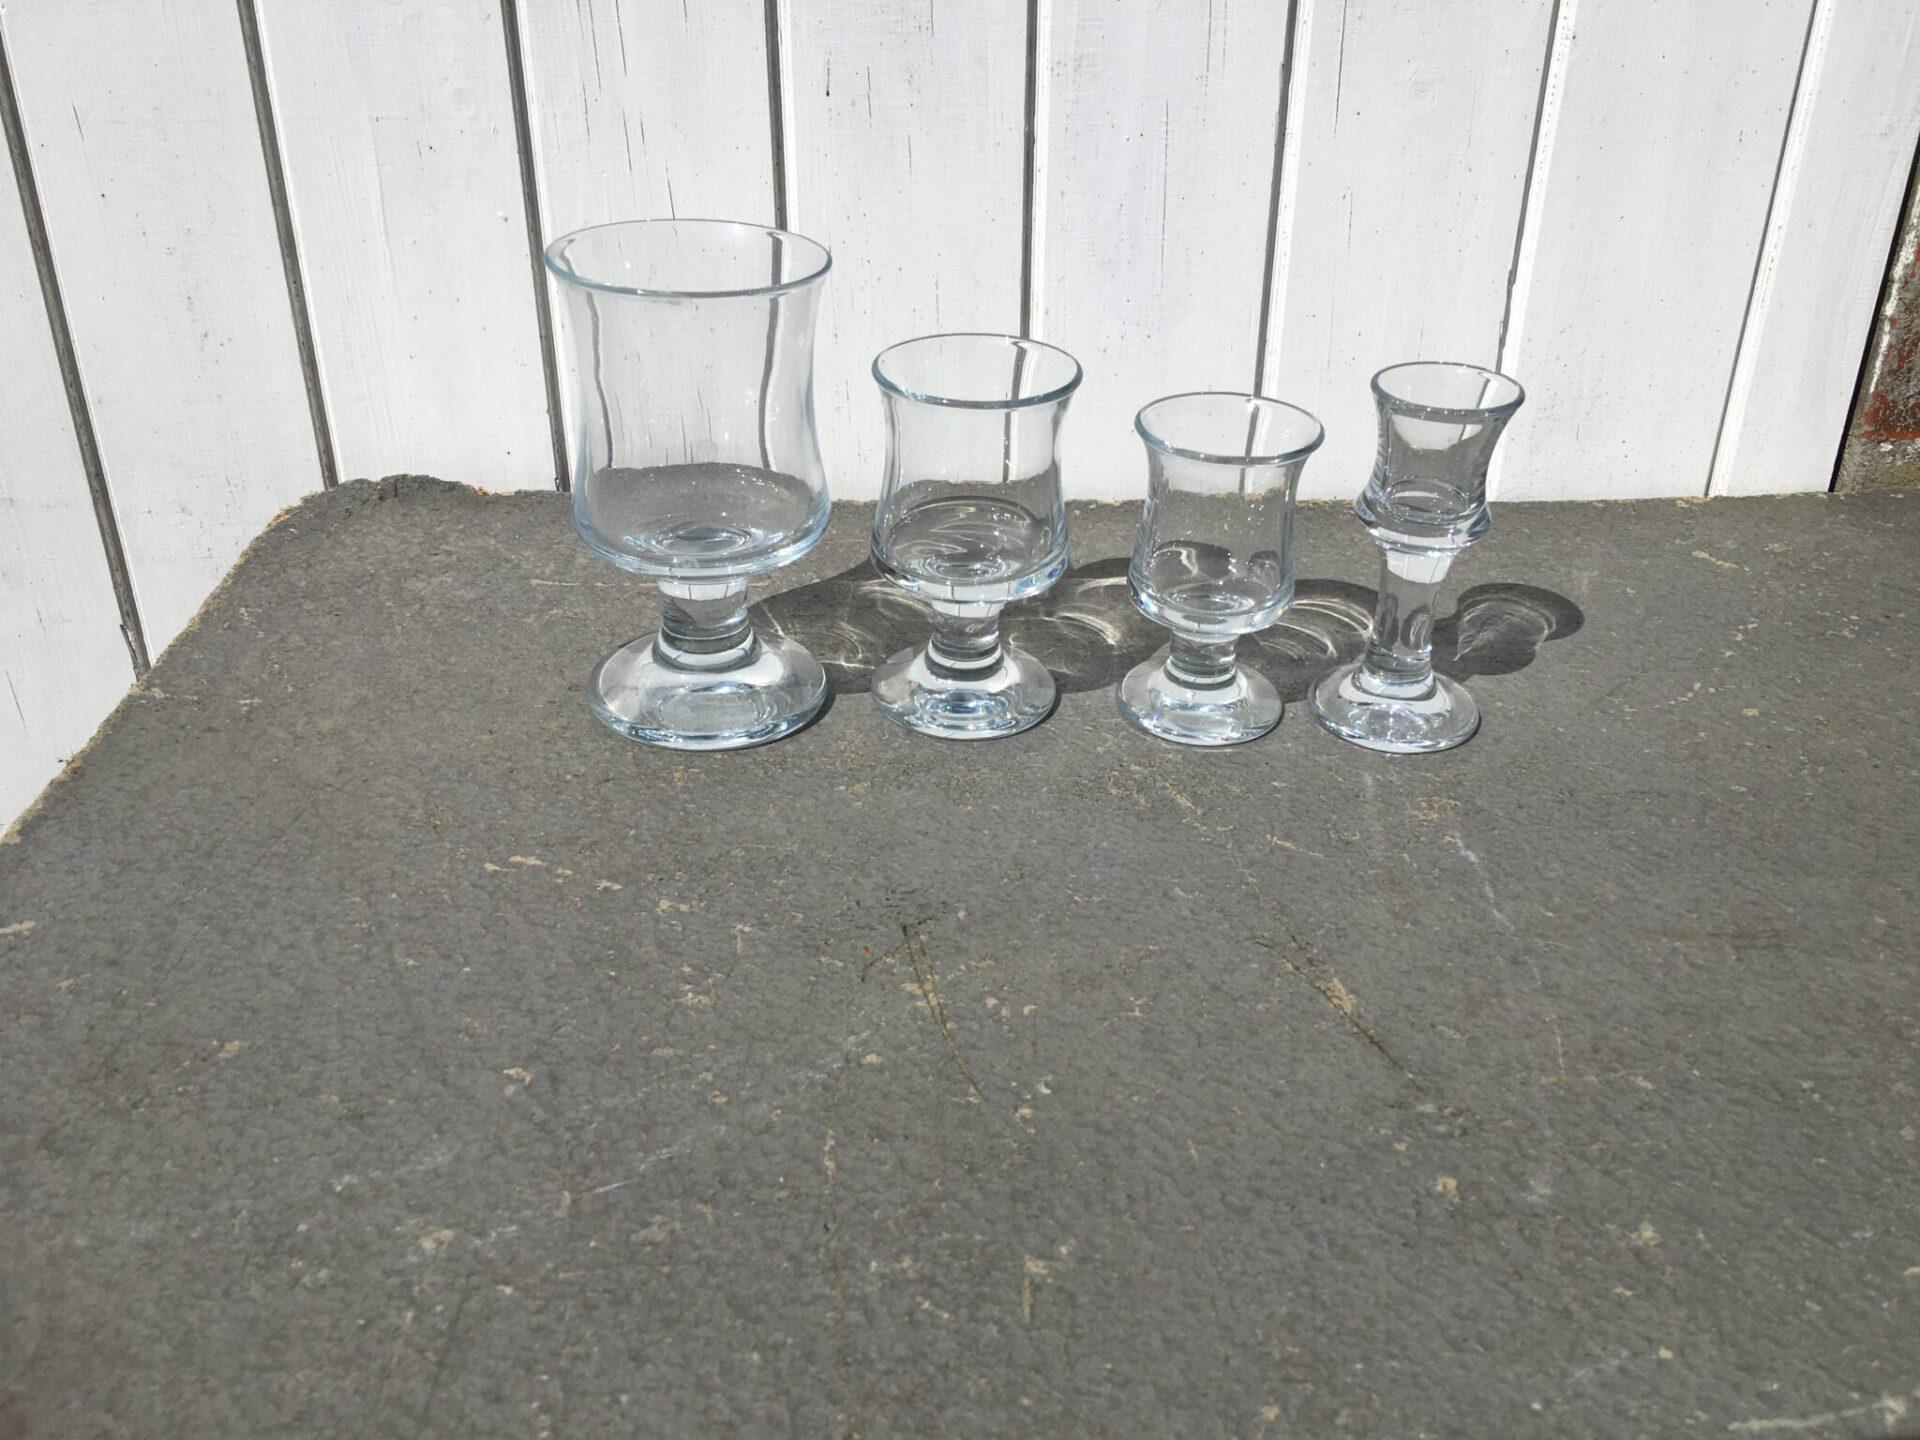 Holmegaard, Skibsglas, pr. stk 30 kr. Velholdte